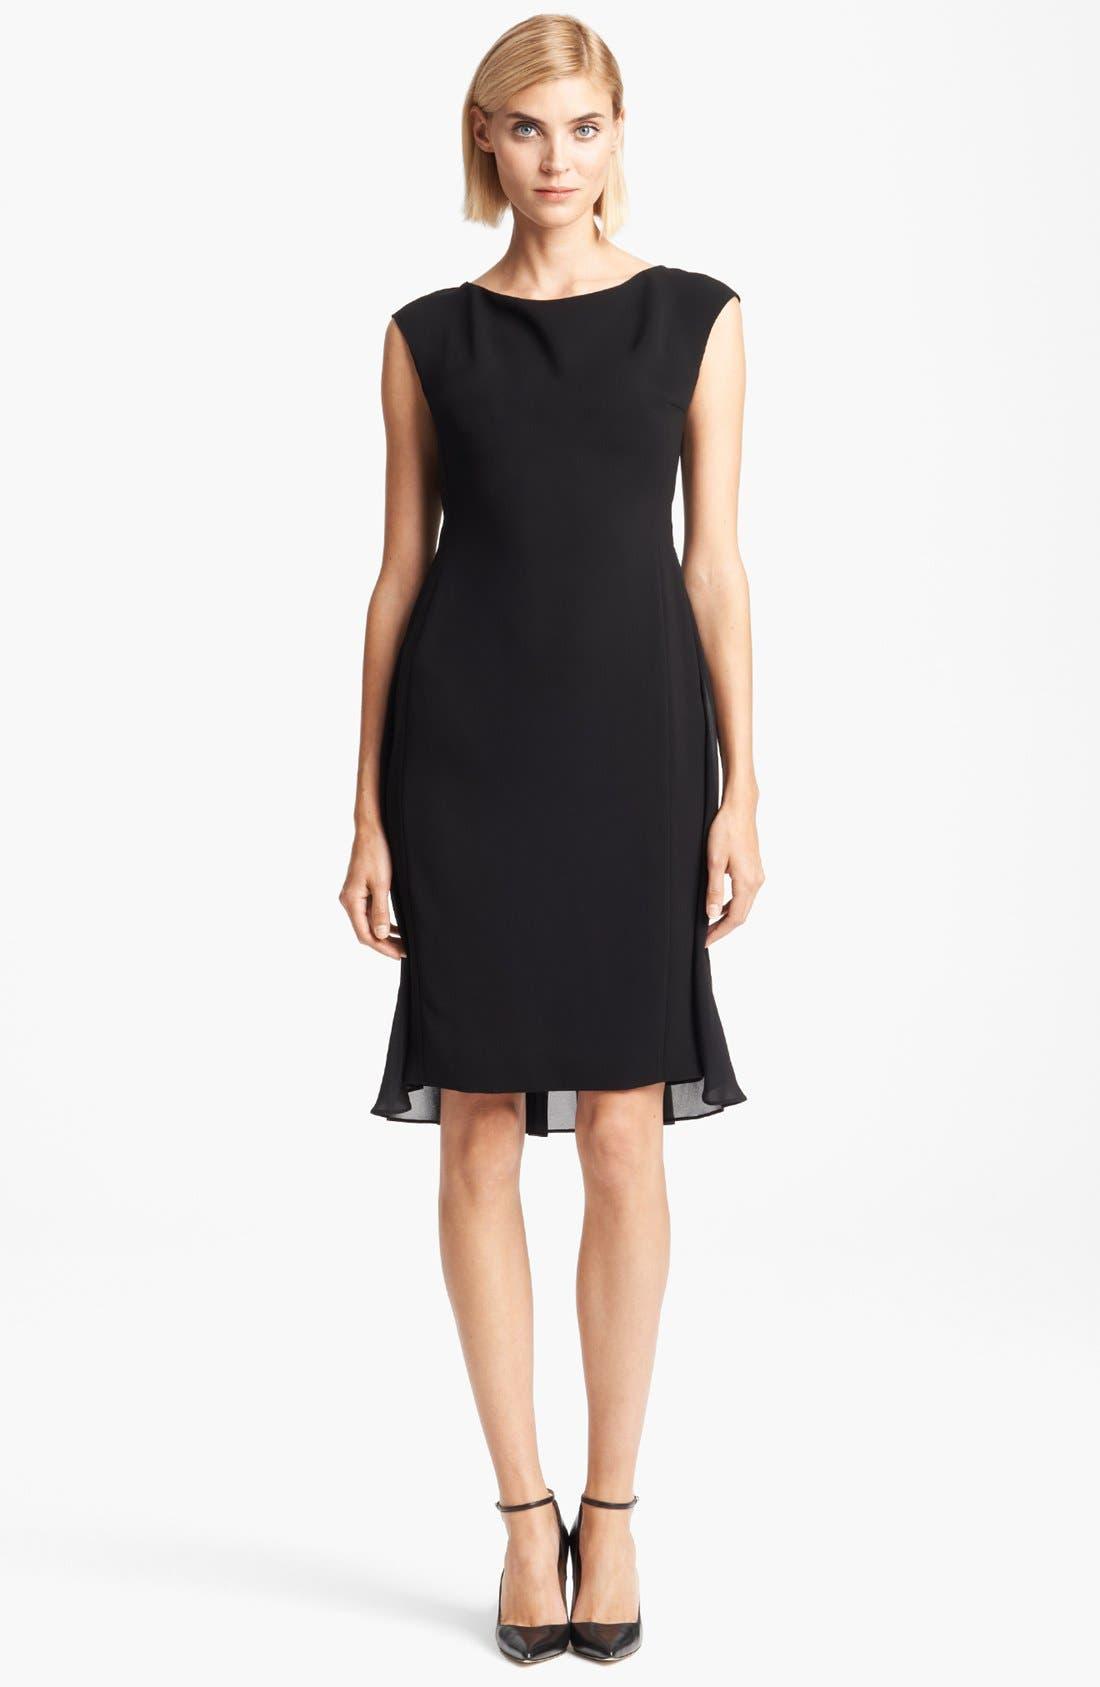 Alternate Image 1 Selected - Max Mara 'Cordoba' Chiffon Dress